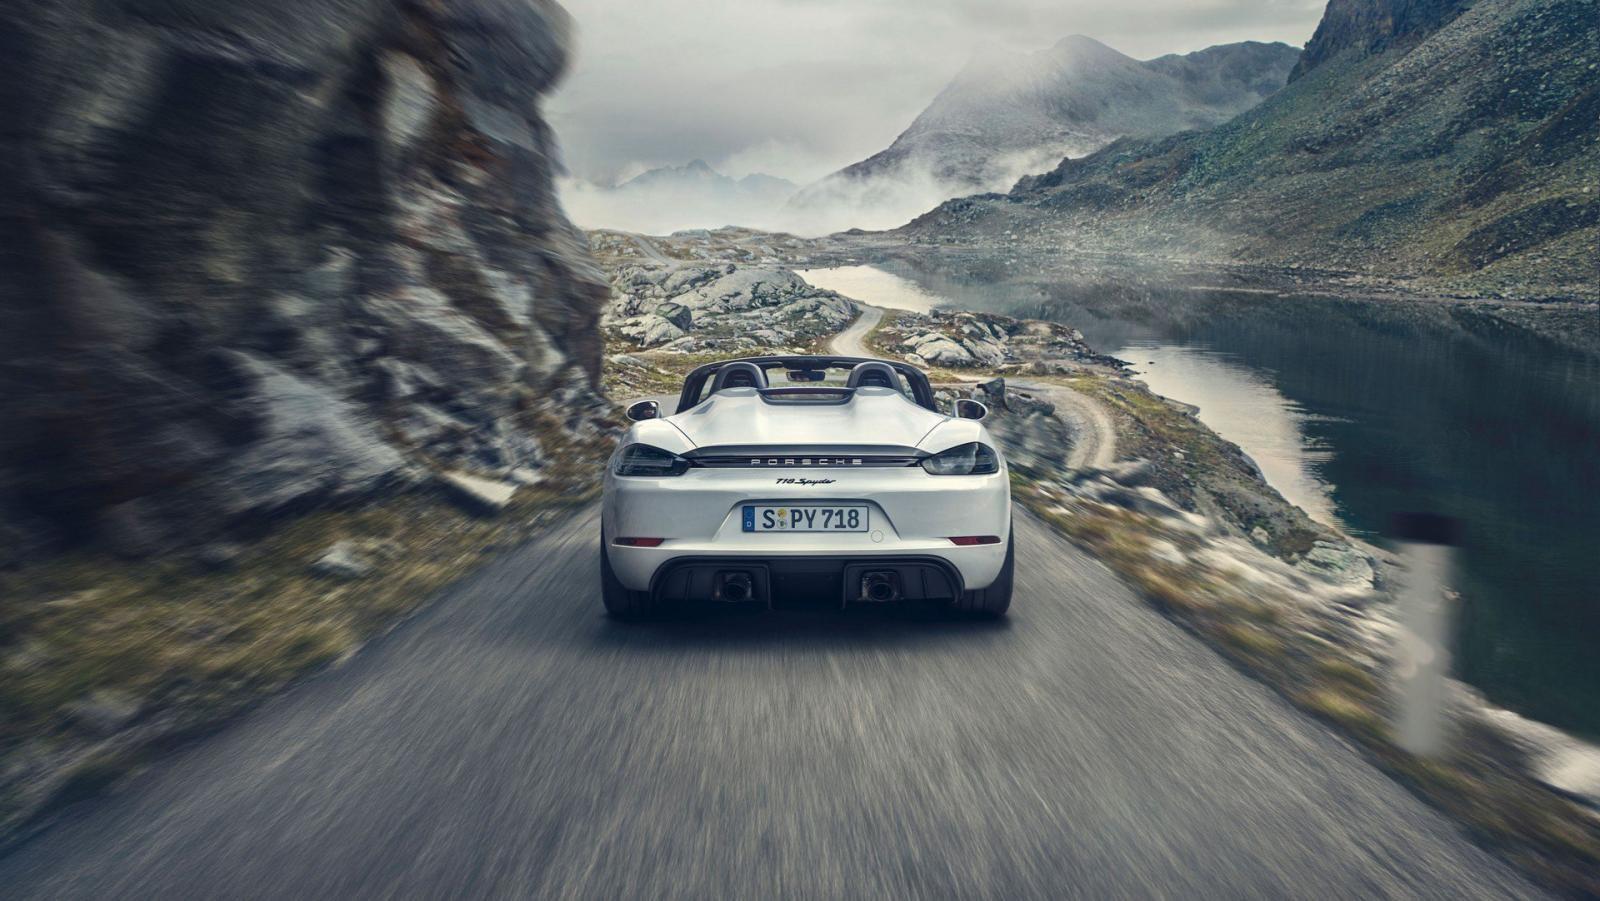 Porsche 718 Boxster Spyder 2020 với thiết kế đuôi xe double bubble